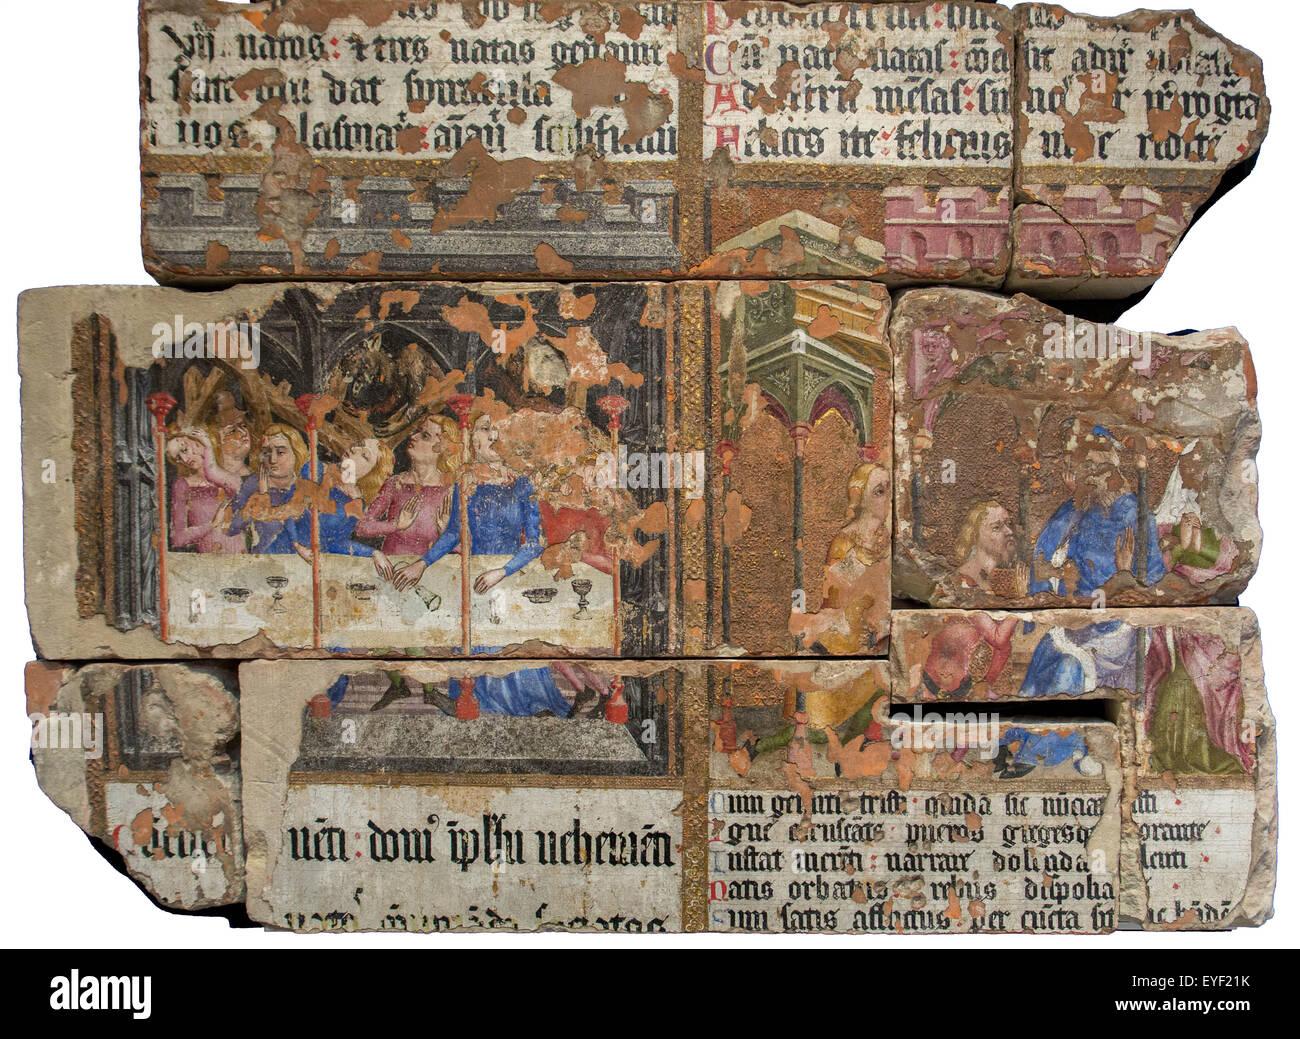 Wandmalerei aus St.-Stephans Kapelle. St.-Stephans war der königlichen Kapelle in der Palace of Westminster, Stockbild